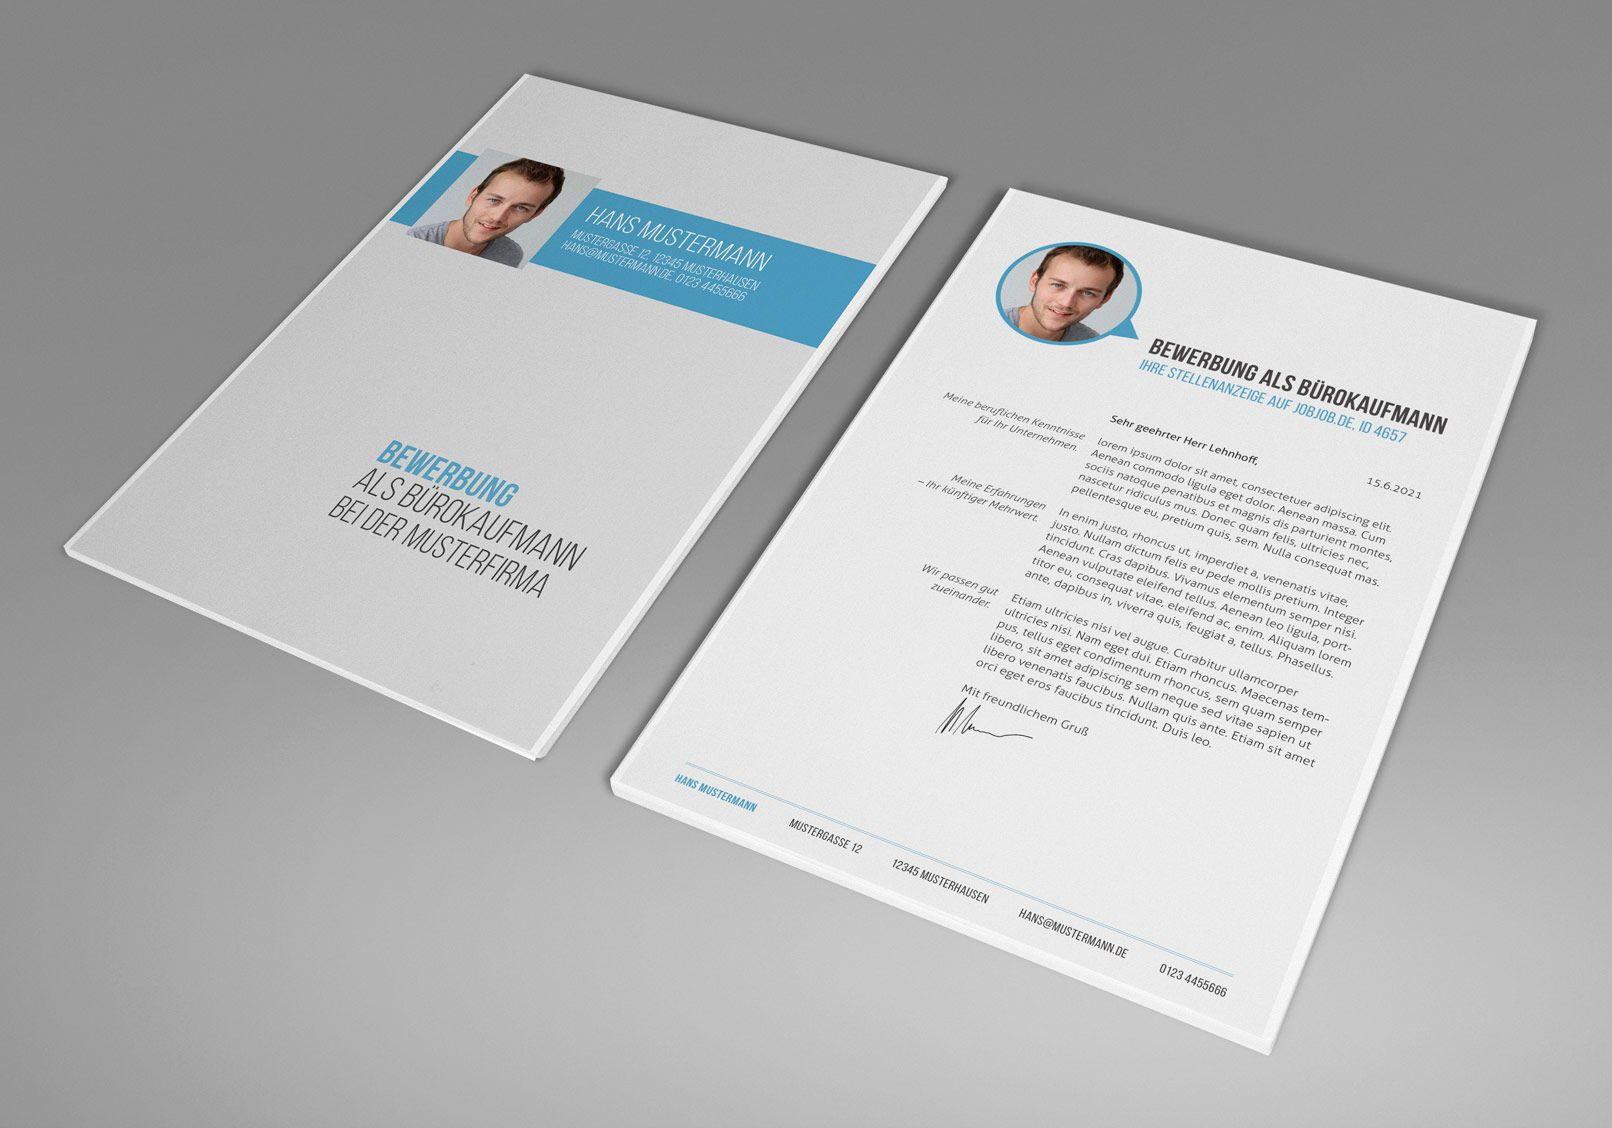 Bewerbung Als Burokauffrau Burokaufmann Design Muster Download Bewerbung Als Burokauffrau Bewerbung Bewerbung Lebenslauf